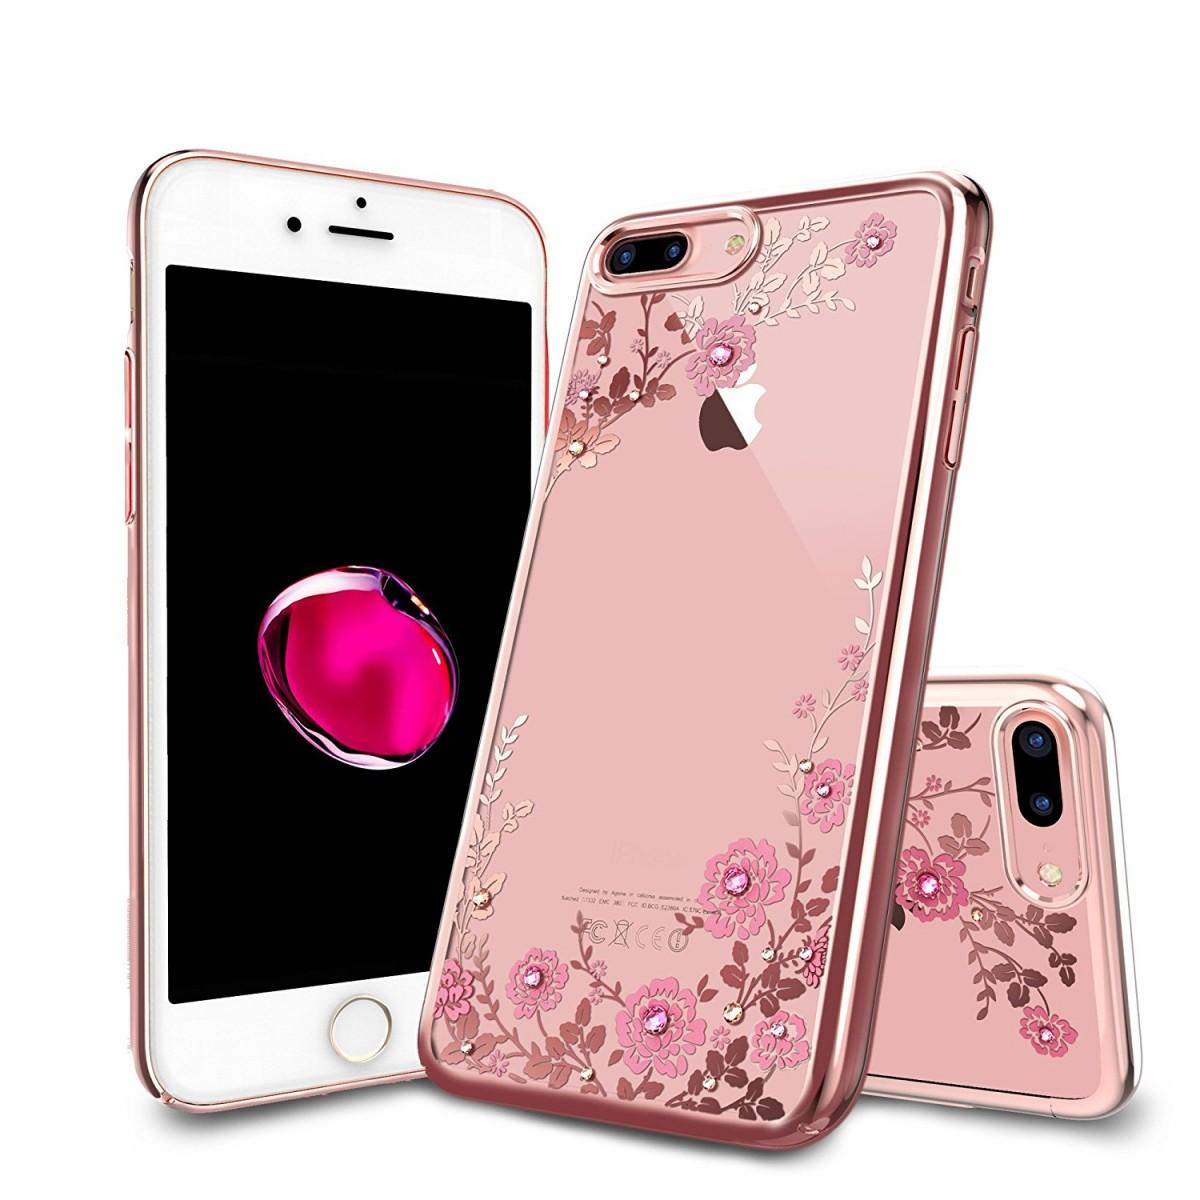 Obal / kryt Crystal Flowers pro iPhone 7 Plus - Růžově zlatý (rose gold)